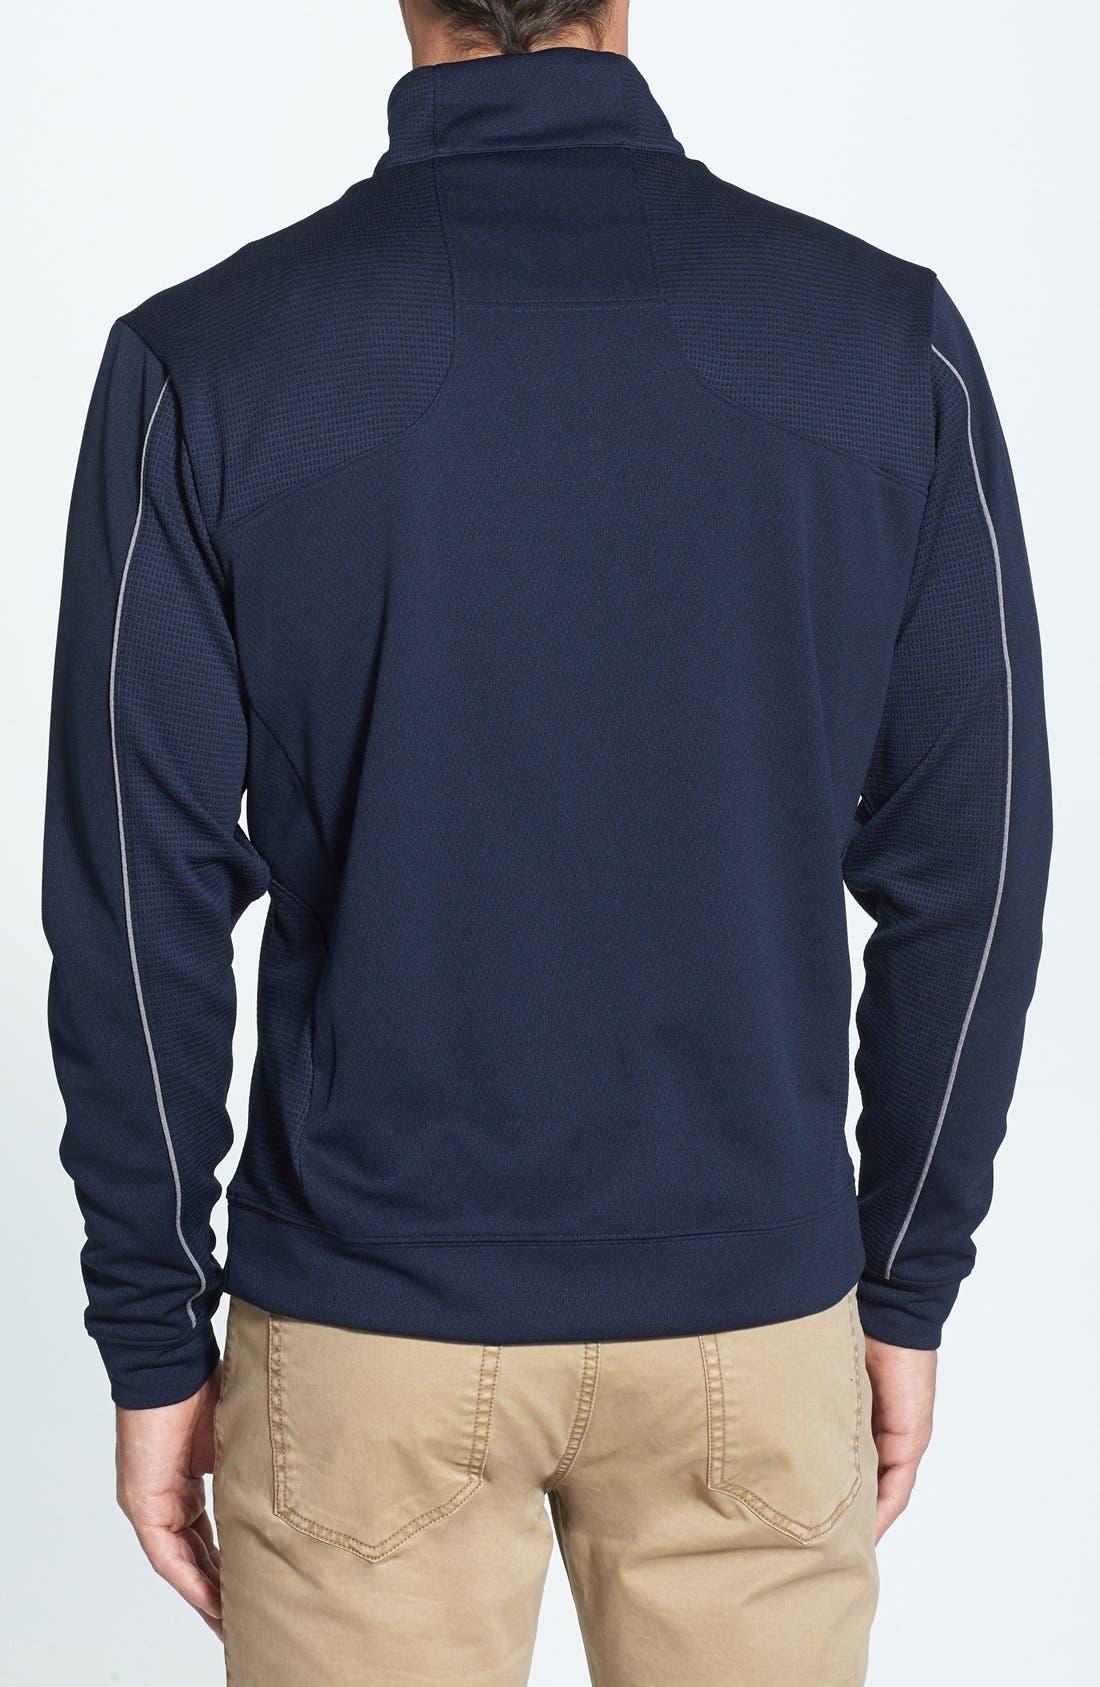 DryTec Half Zip Pullover,                             Alternate thumbnail 2, color,                             NAVY BLUE